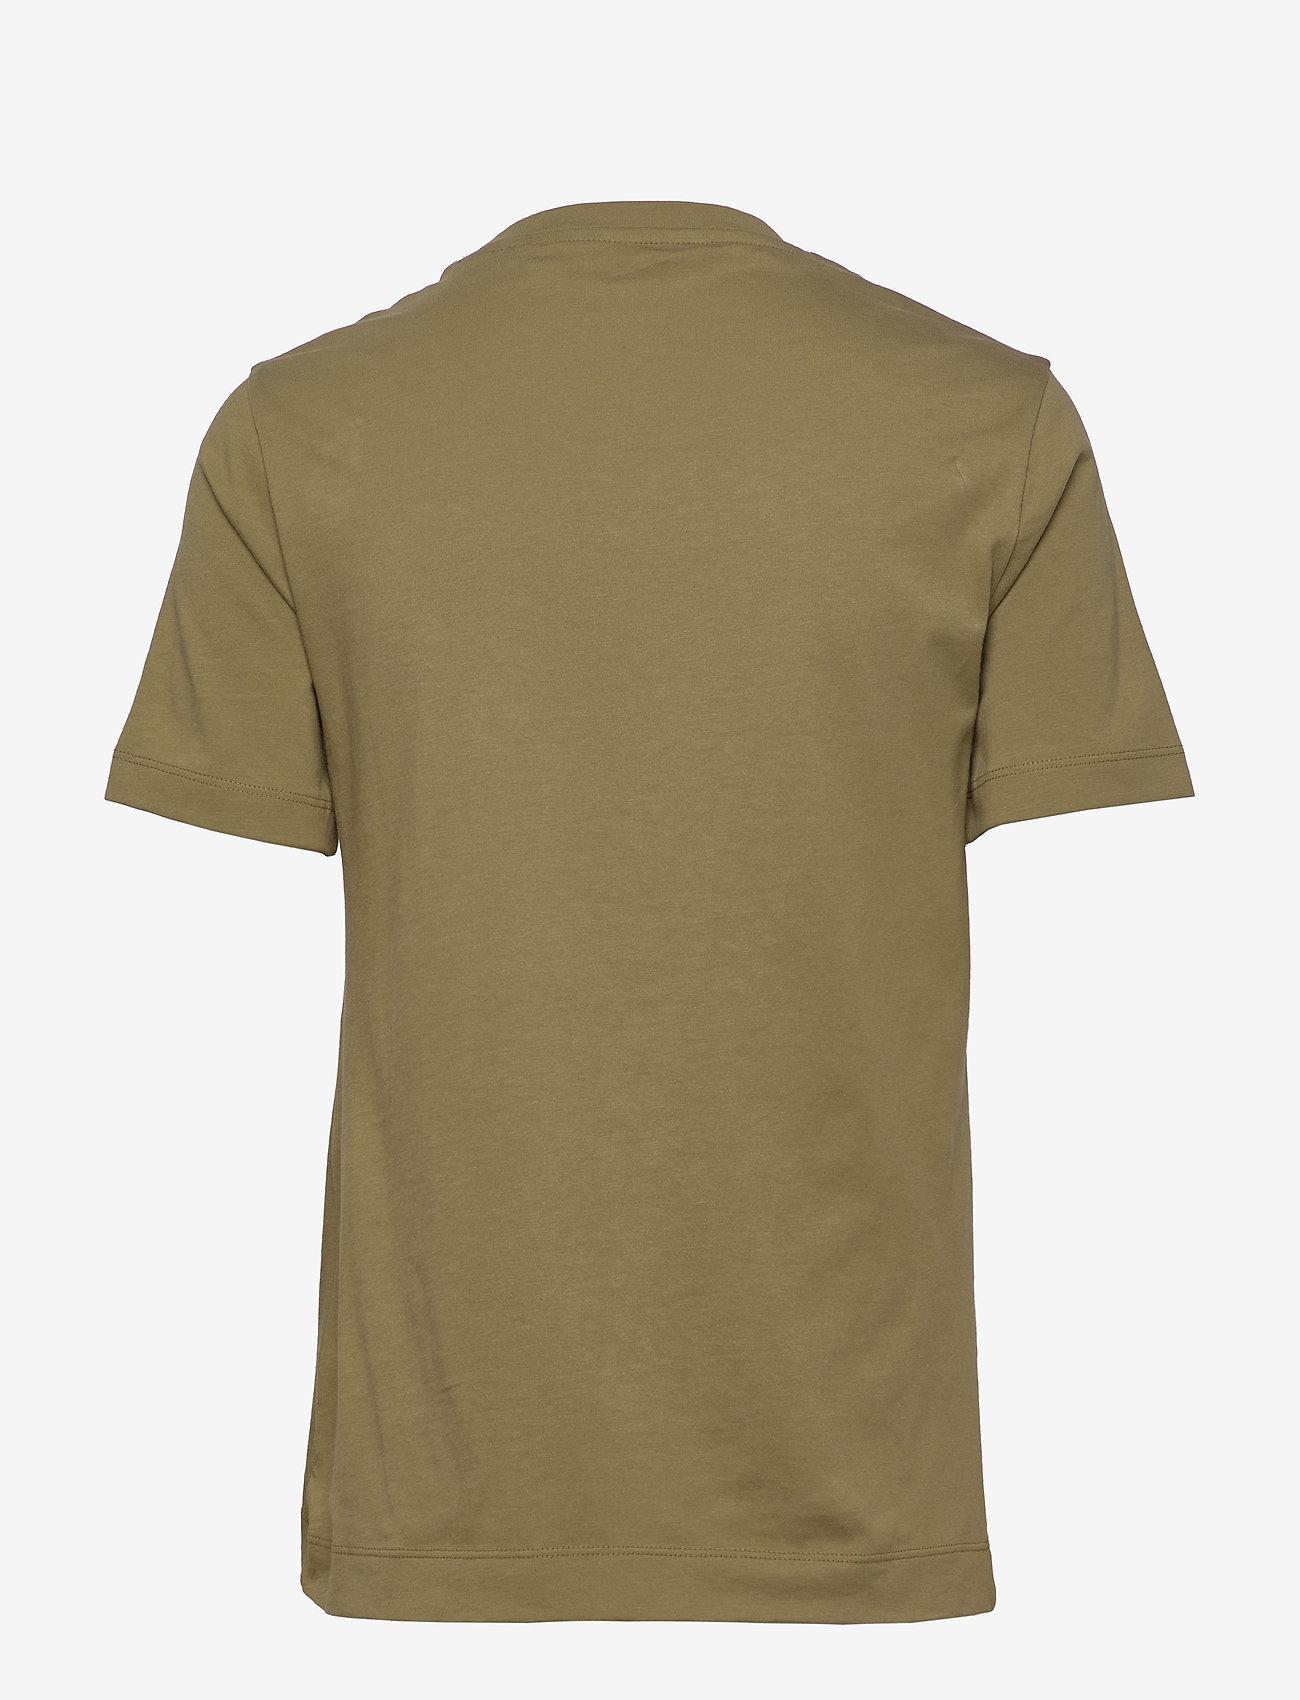 GANT - ORIGINAL SS T-SHIRT - basic t-shirts - olive green - 1